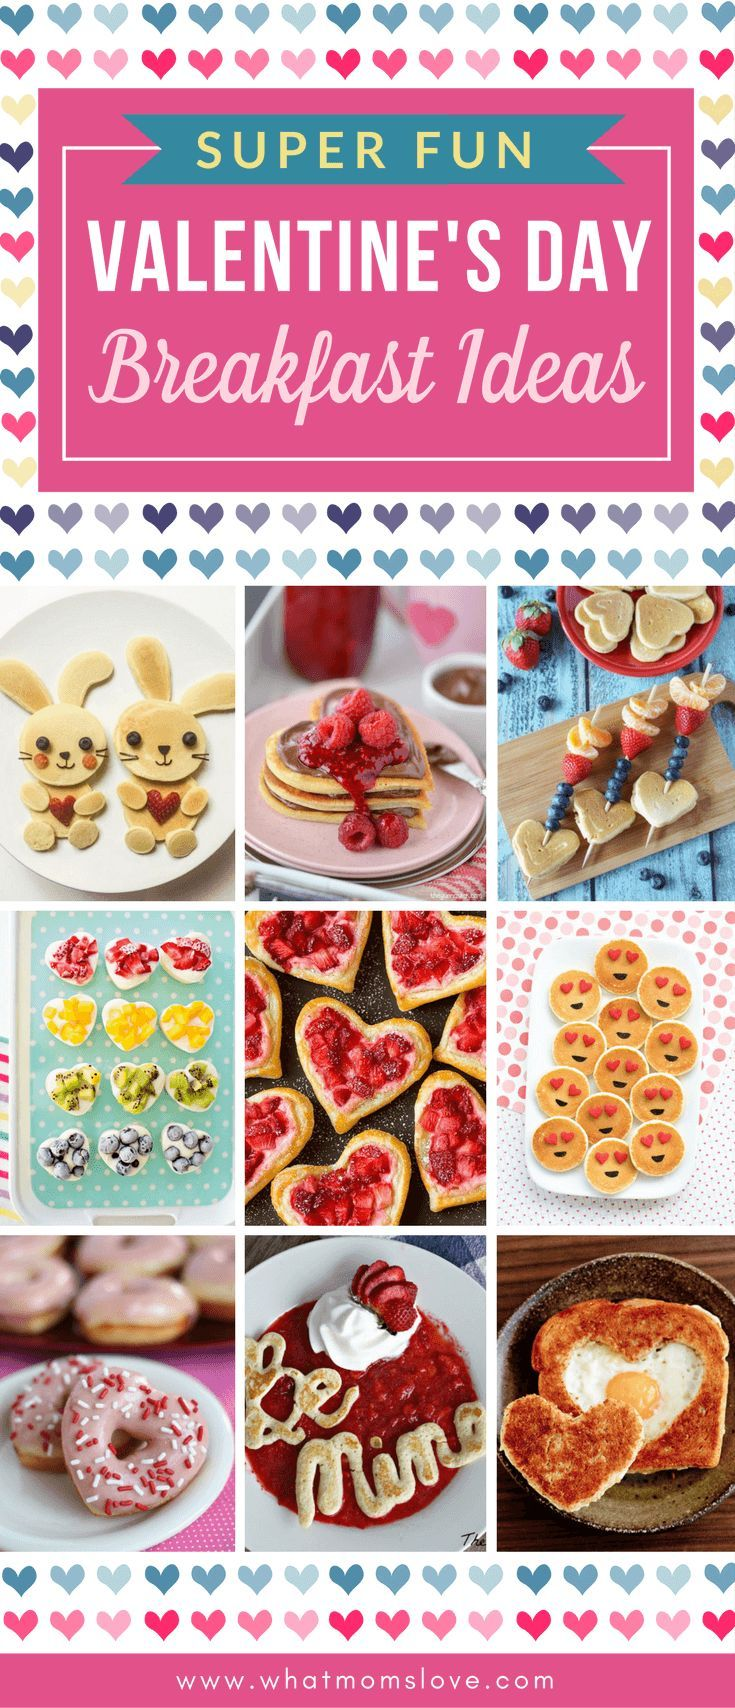 50 valentines day food ideas for kids fun recipes for breakfast 50 valentines day food ideas for kids fun recipes for breakfast and beyond san valentn besos y santos forumfinder Images